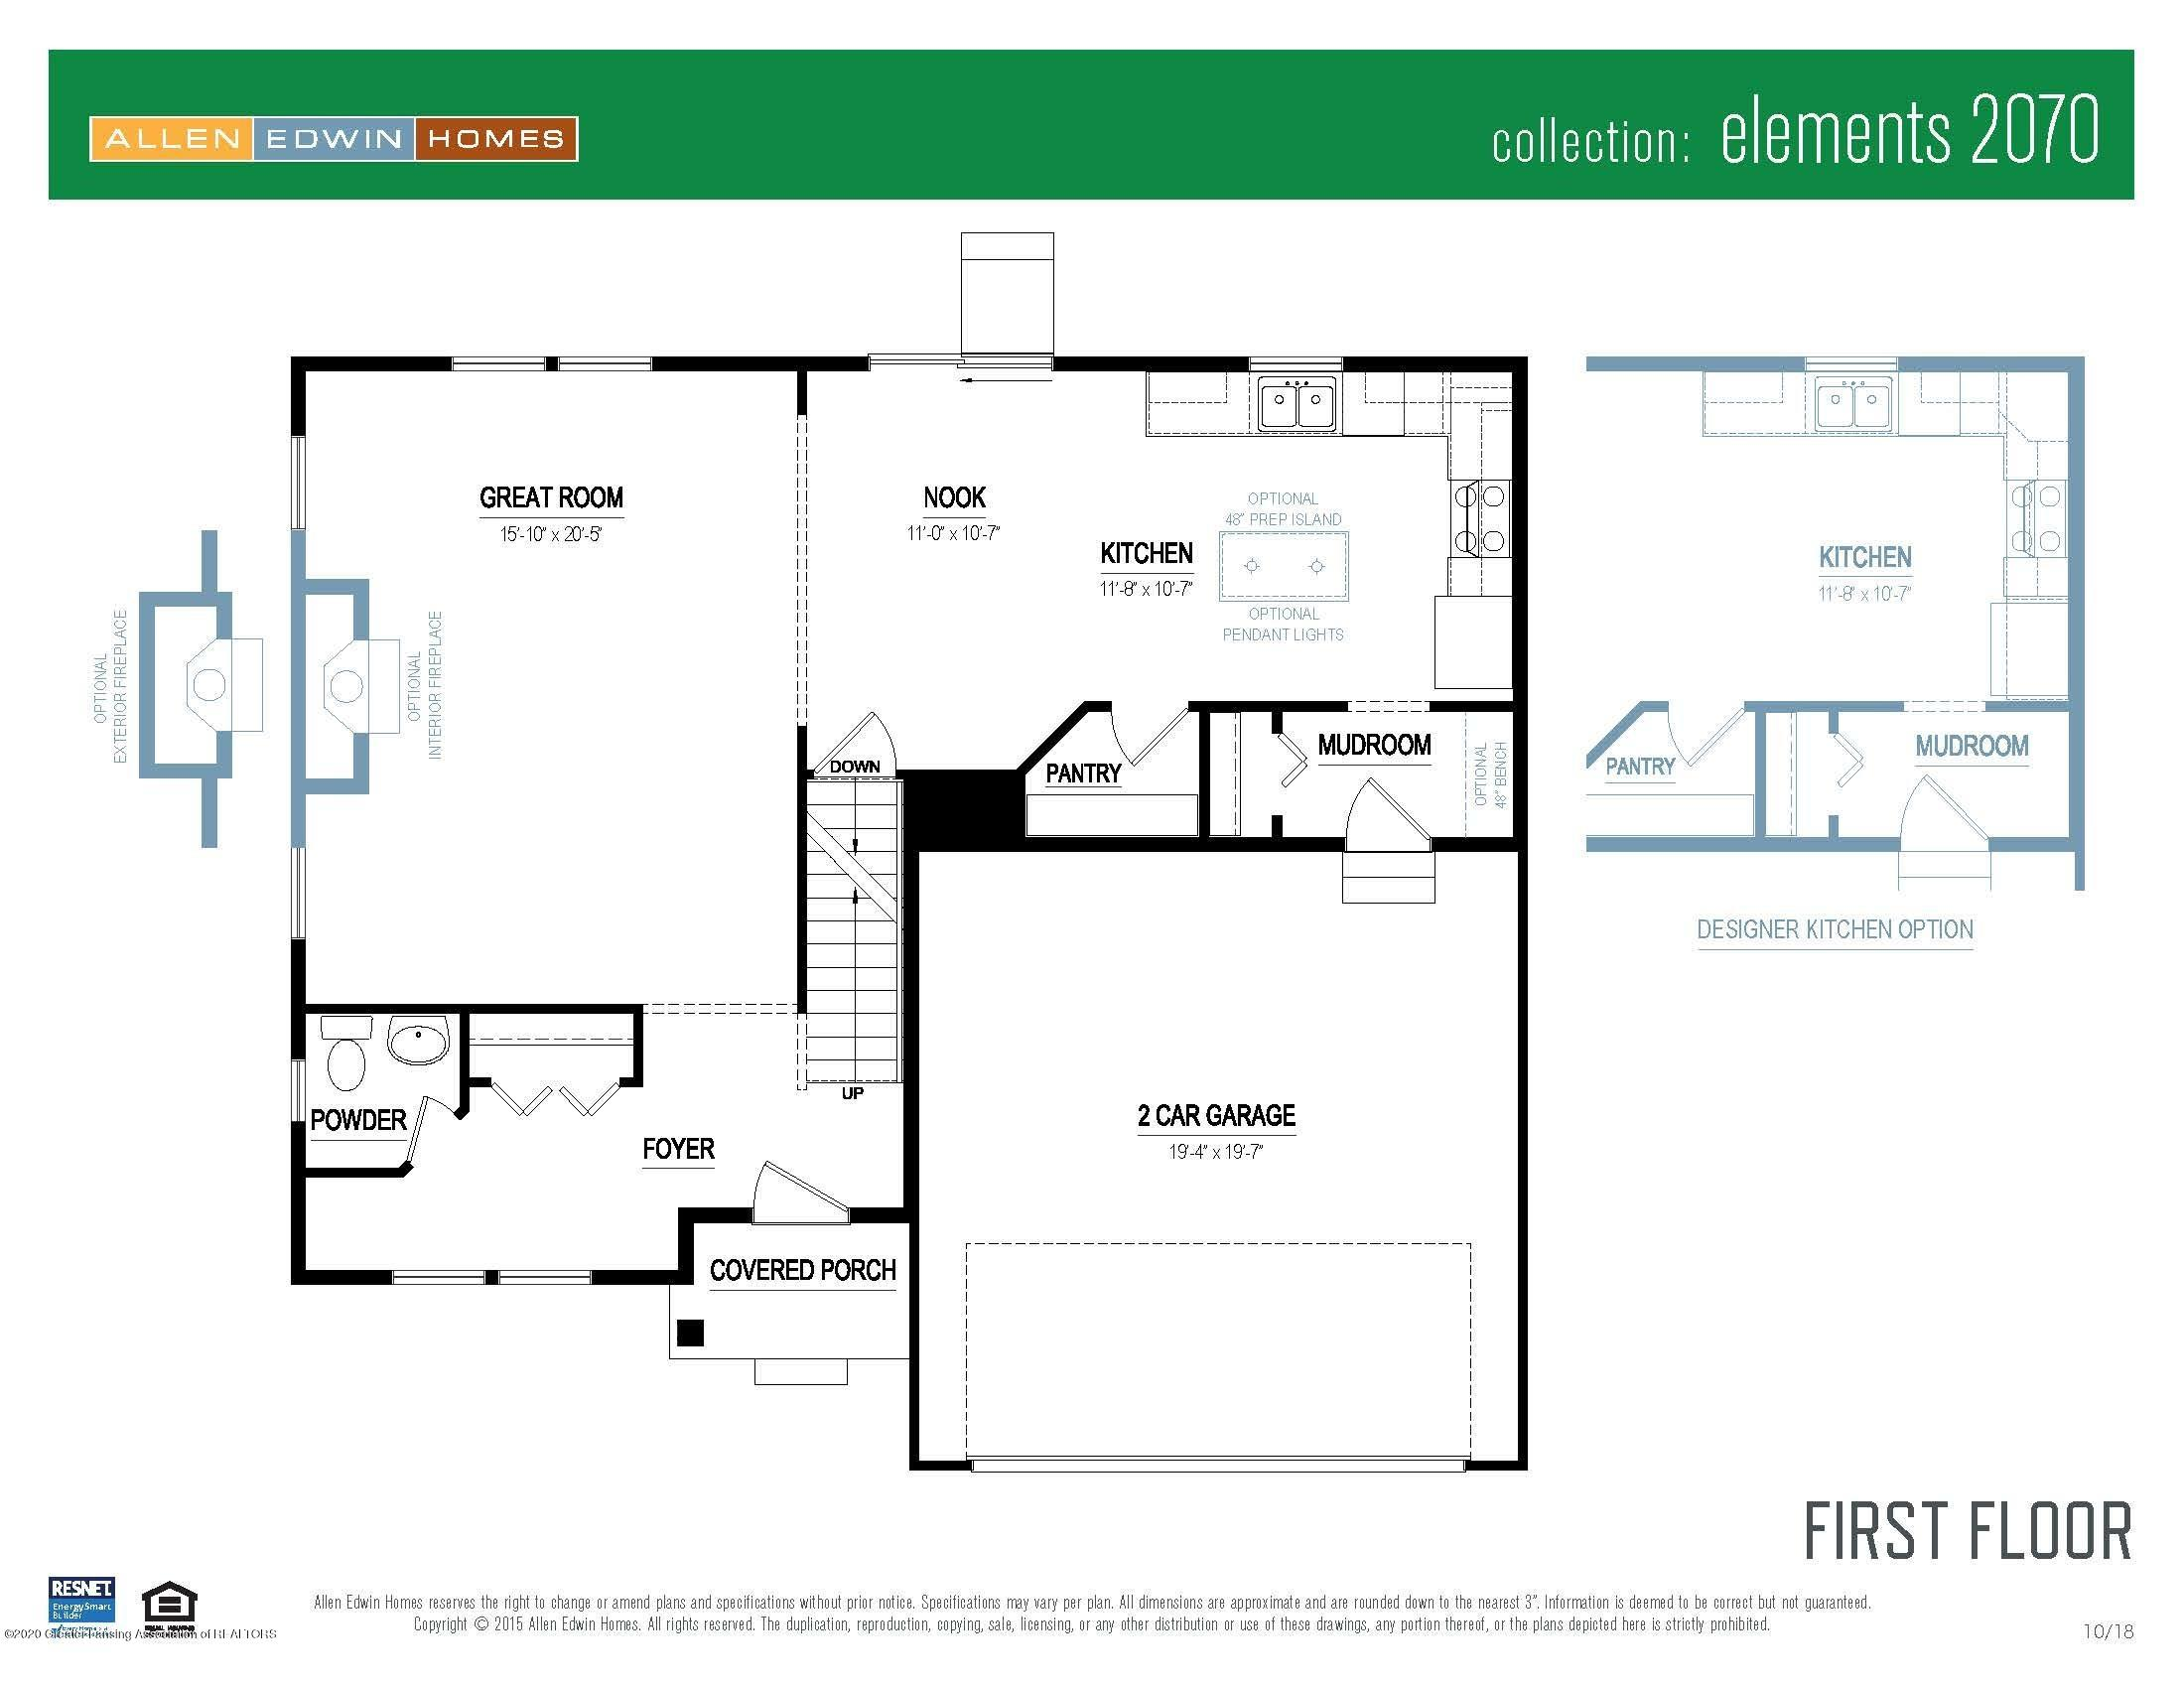 6460 Savanna Way - Elements 2070 V8.0a First Floor - 18